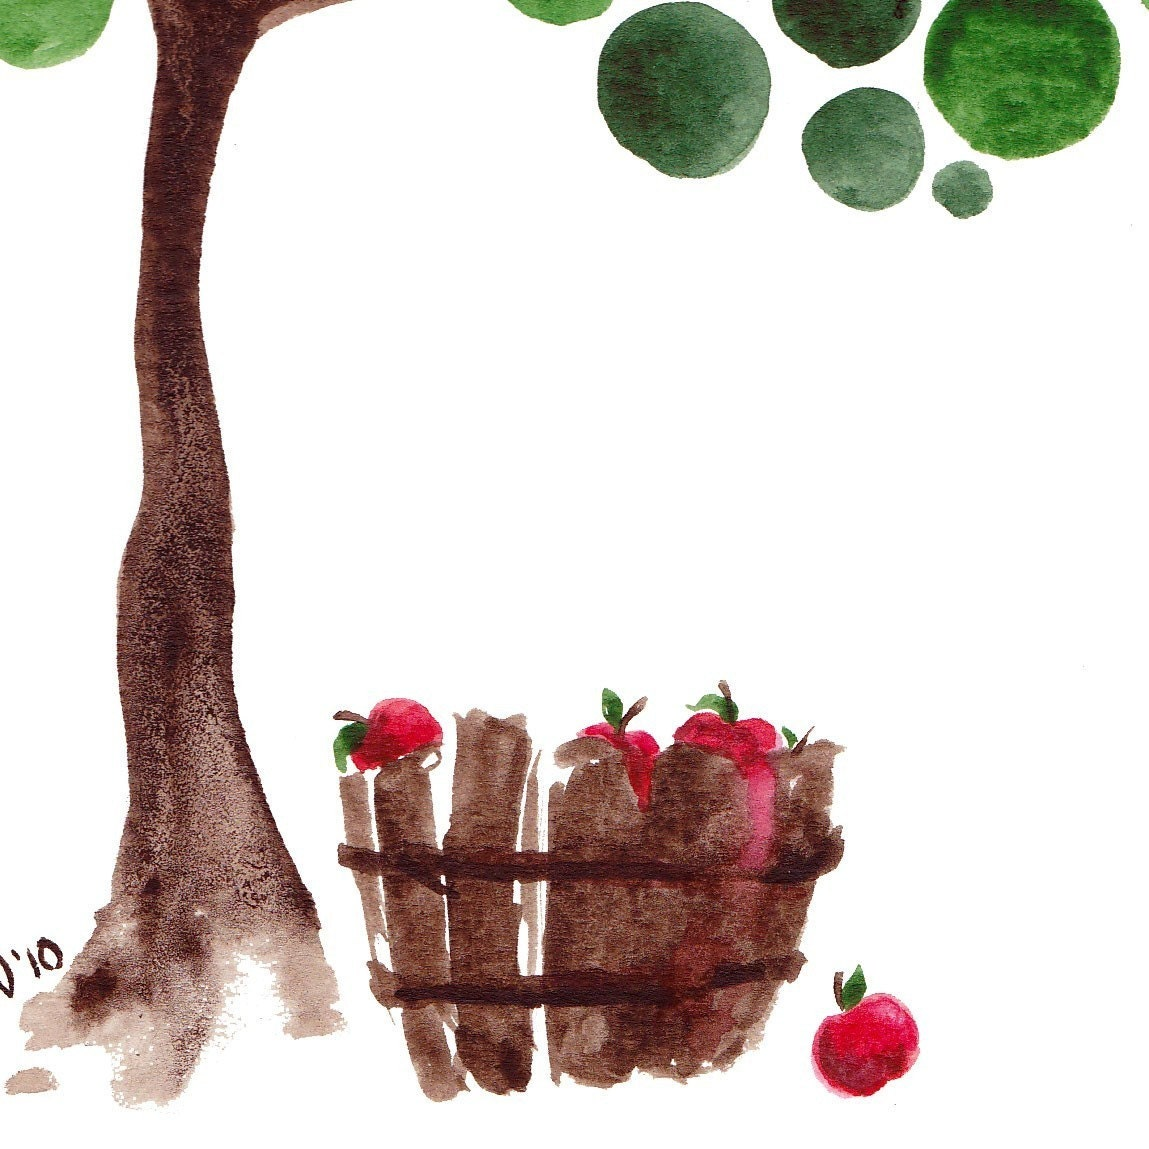 Sappho's Tree Watercolor Art Print Wall Artwork Poster